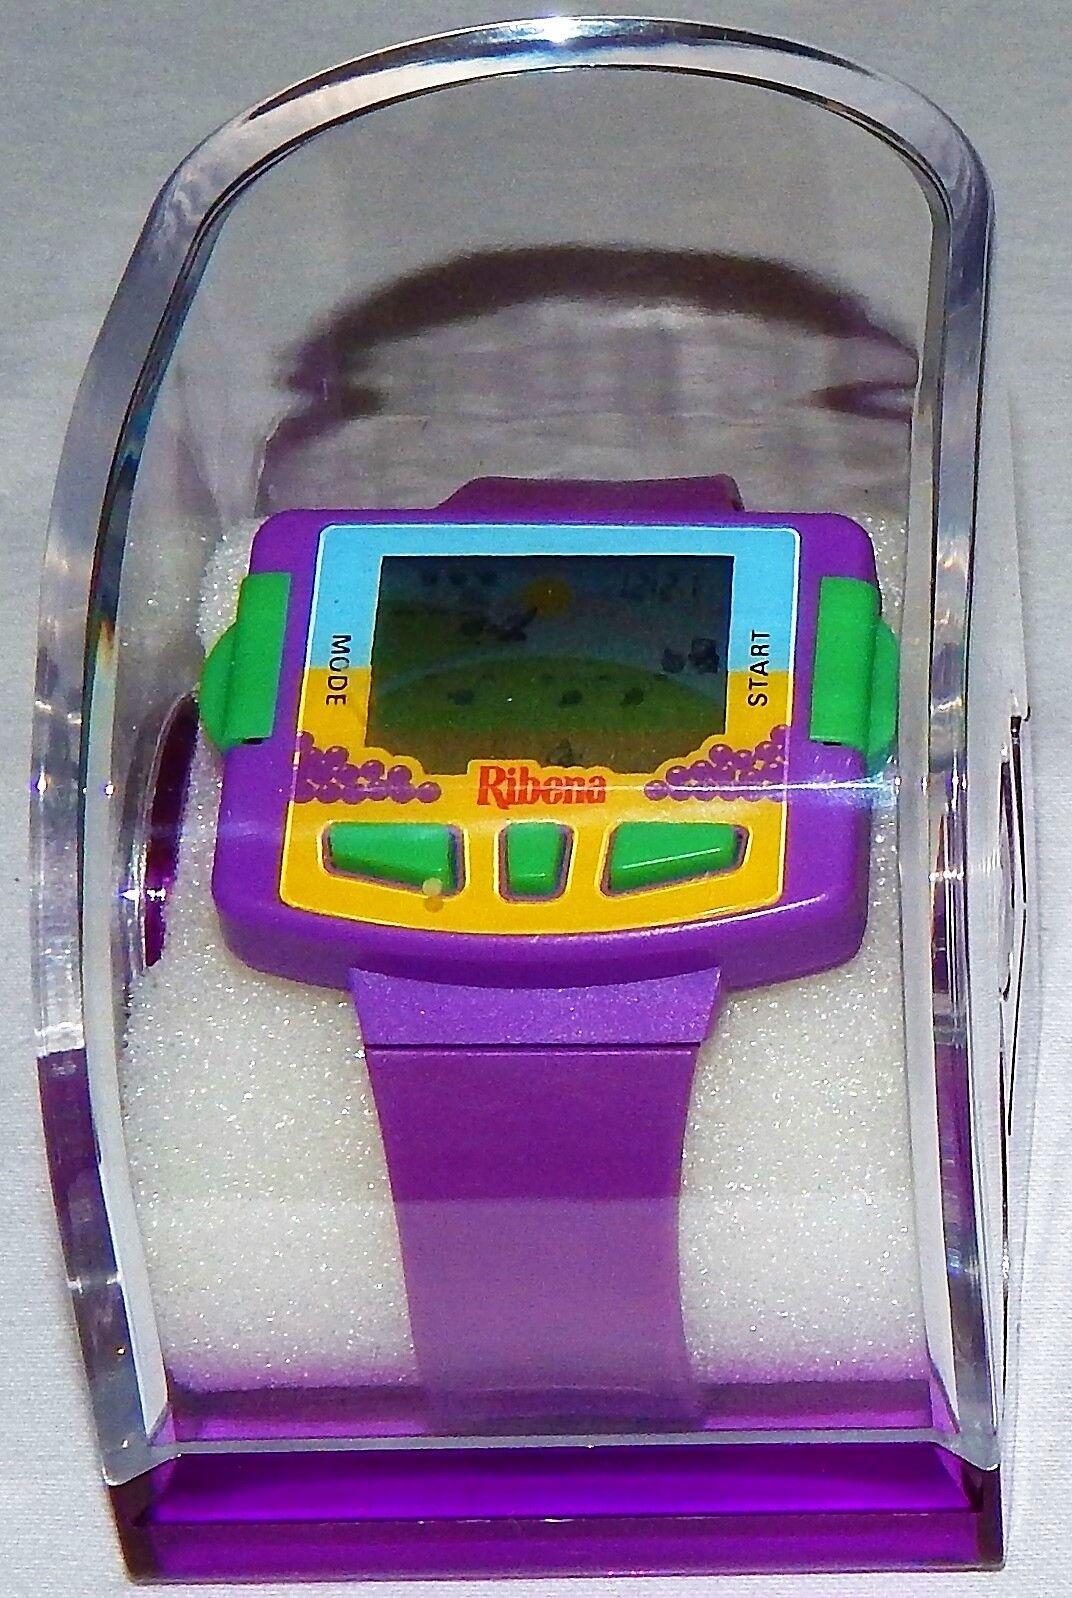 EXTREMELY RARE VINTAGE RIBENA LCD ELECTRONIC HANDHELD GAME & WRIST WATCH NOS